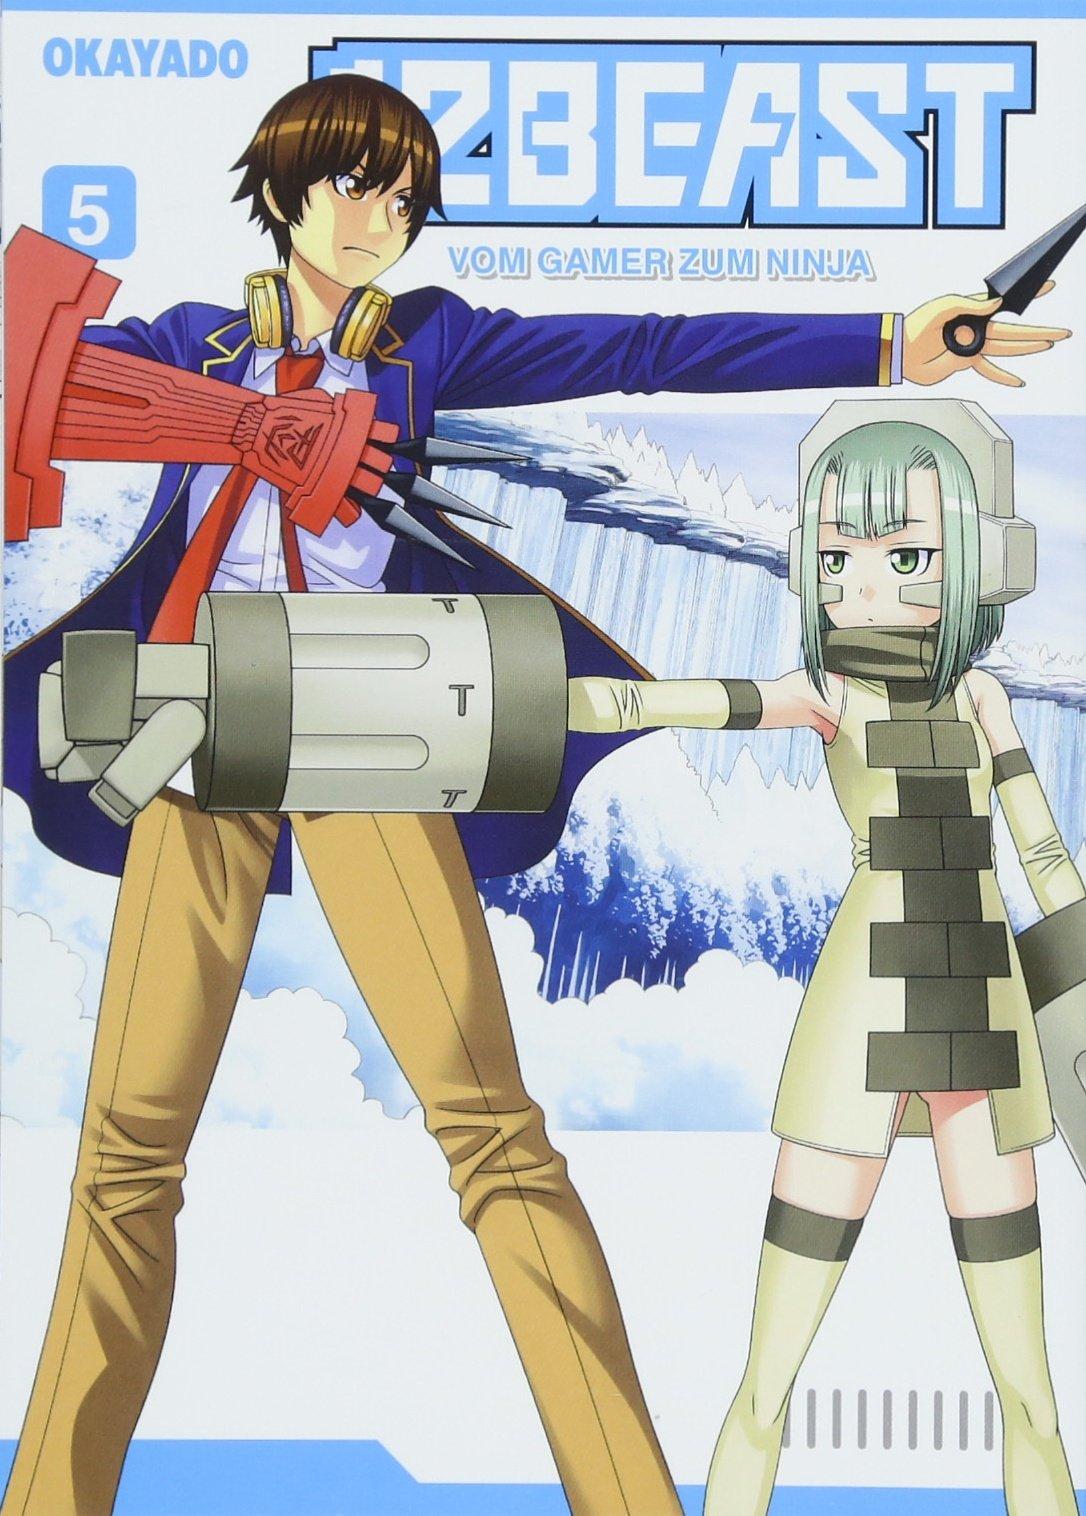 12 Beast - Vom Gamer zum Ninja: Bd. 5: Amazon.es: Okayado ...